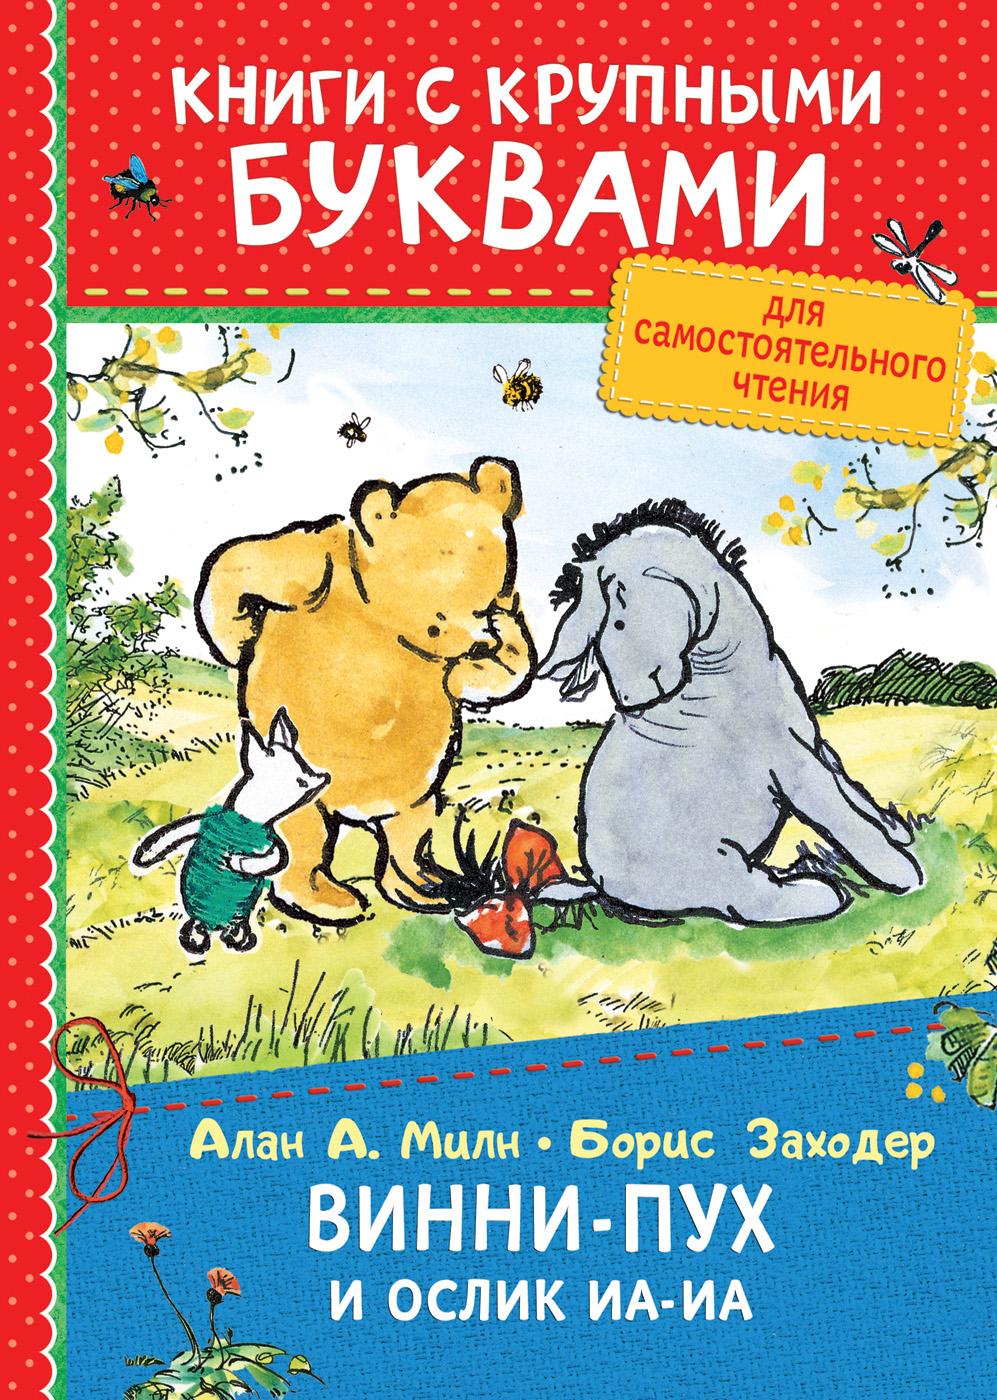 Алан А. Милн Винни-Пух и ослик Иа-Иа